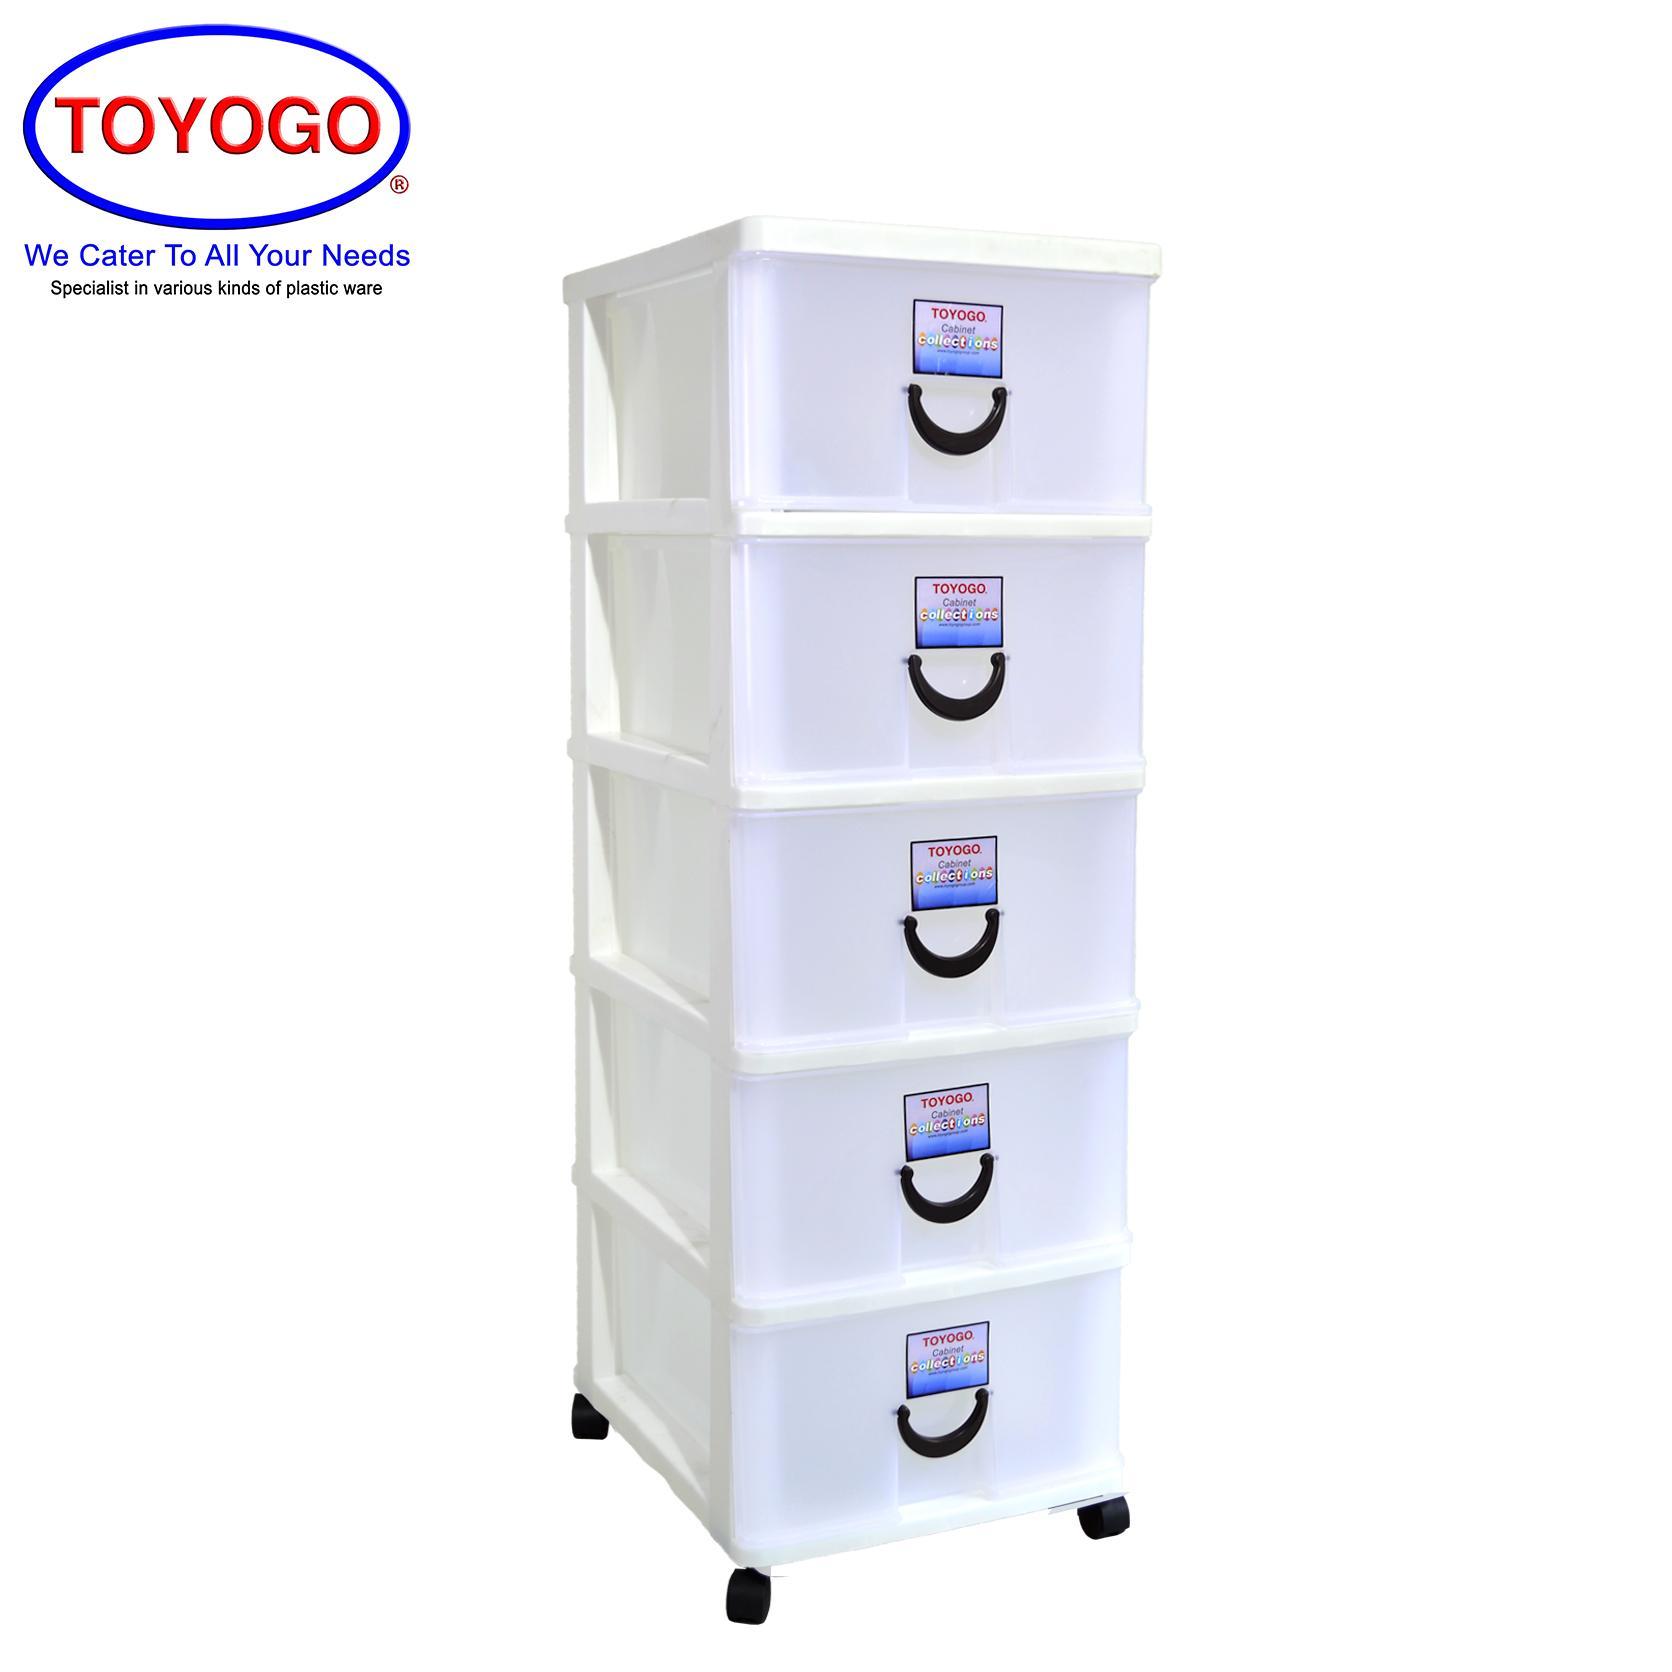 Toyogo [5 Tier] Plastic Storage Cabinet / Drawer With Wheels [803-5]